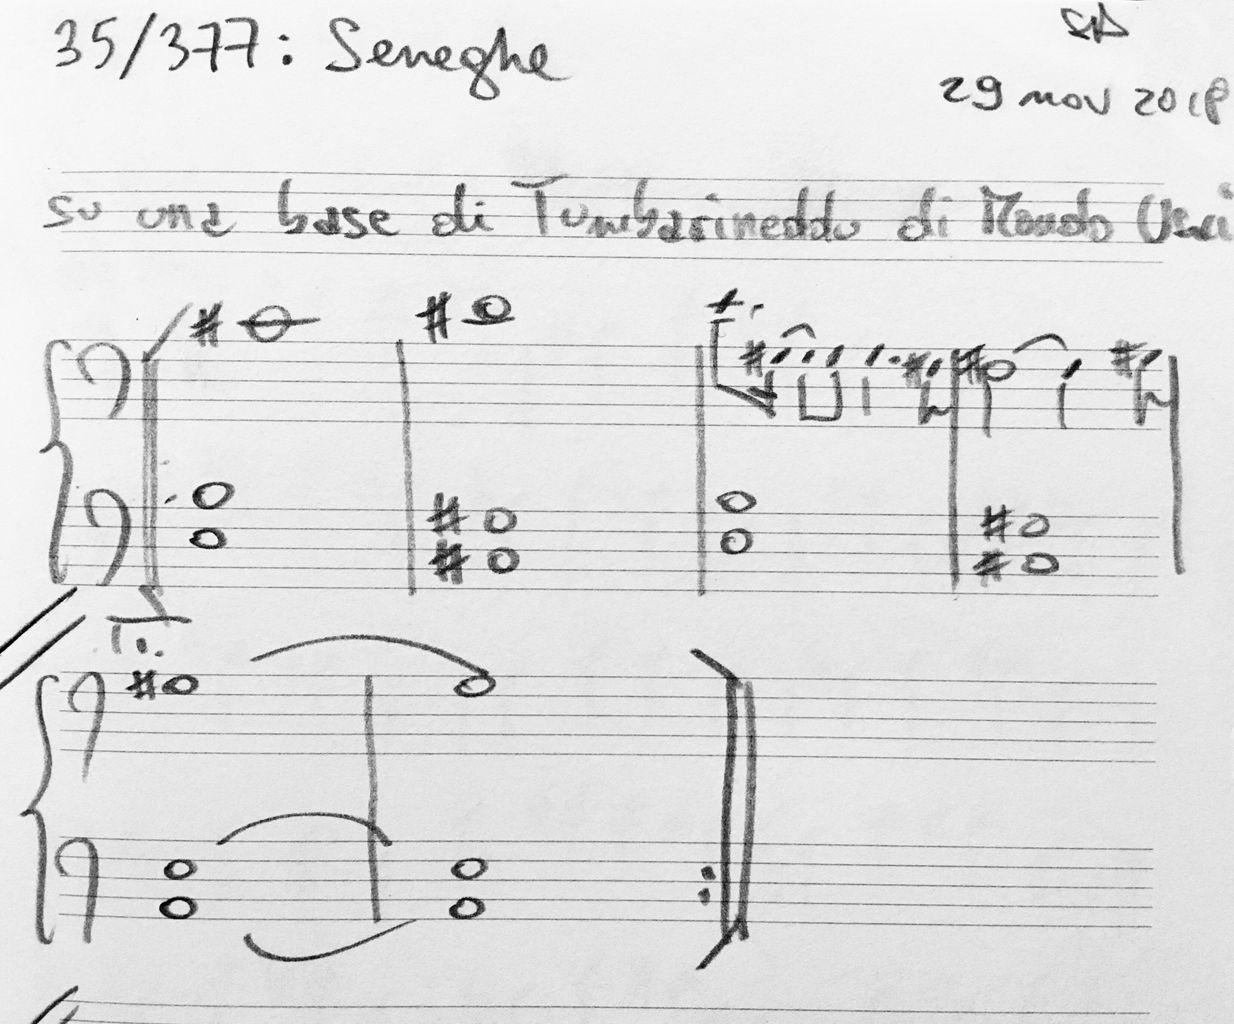 035-Seneghe-Score